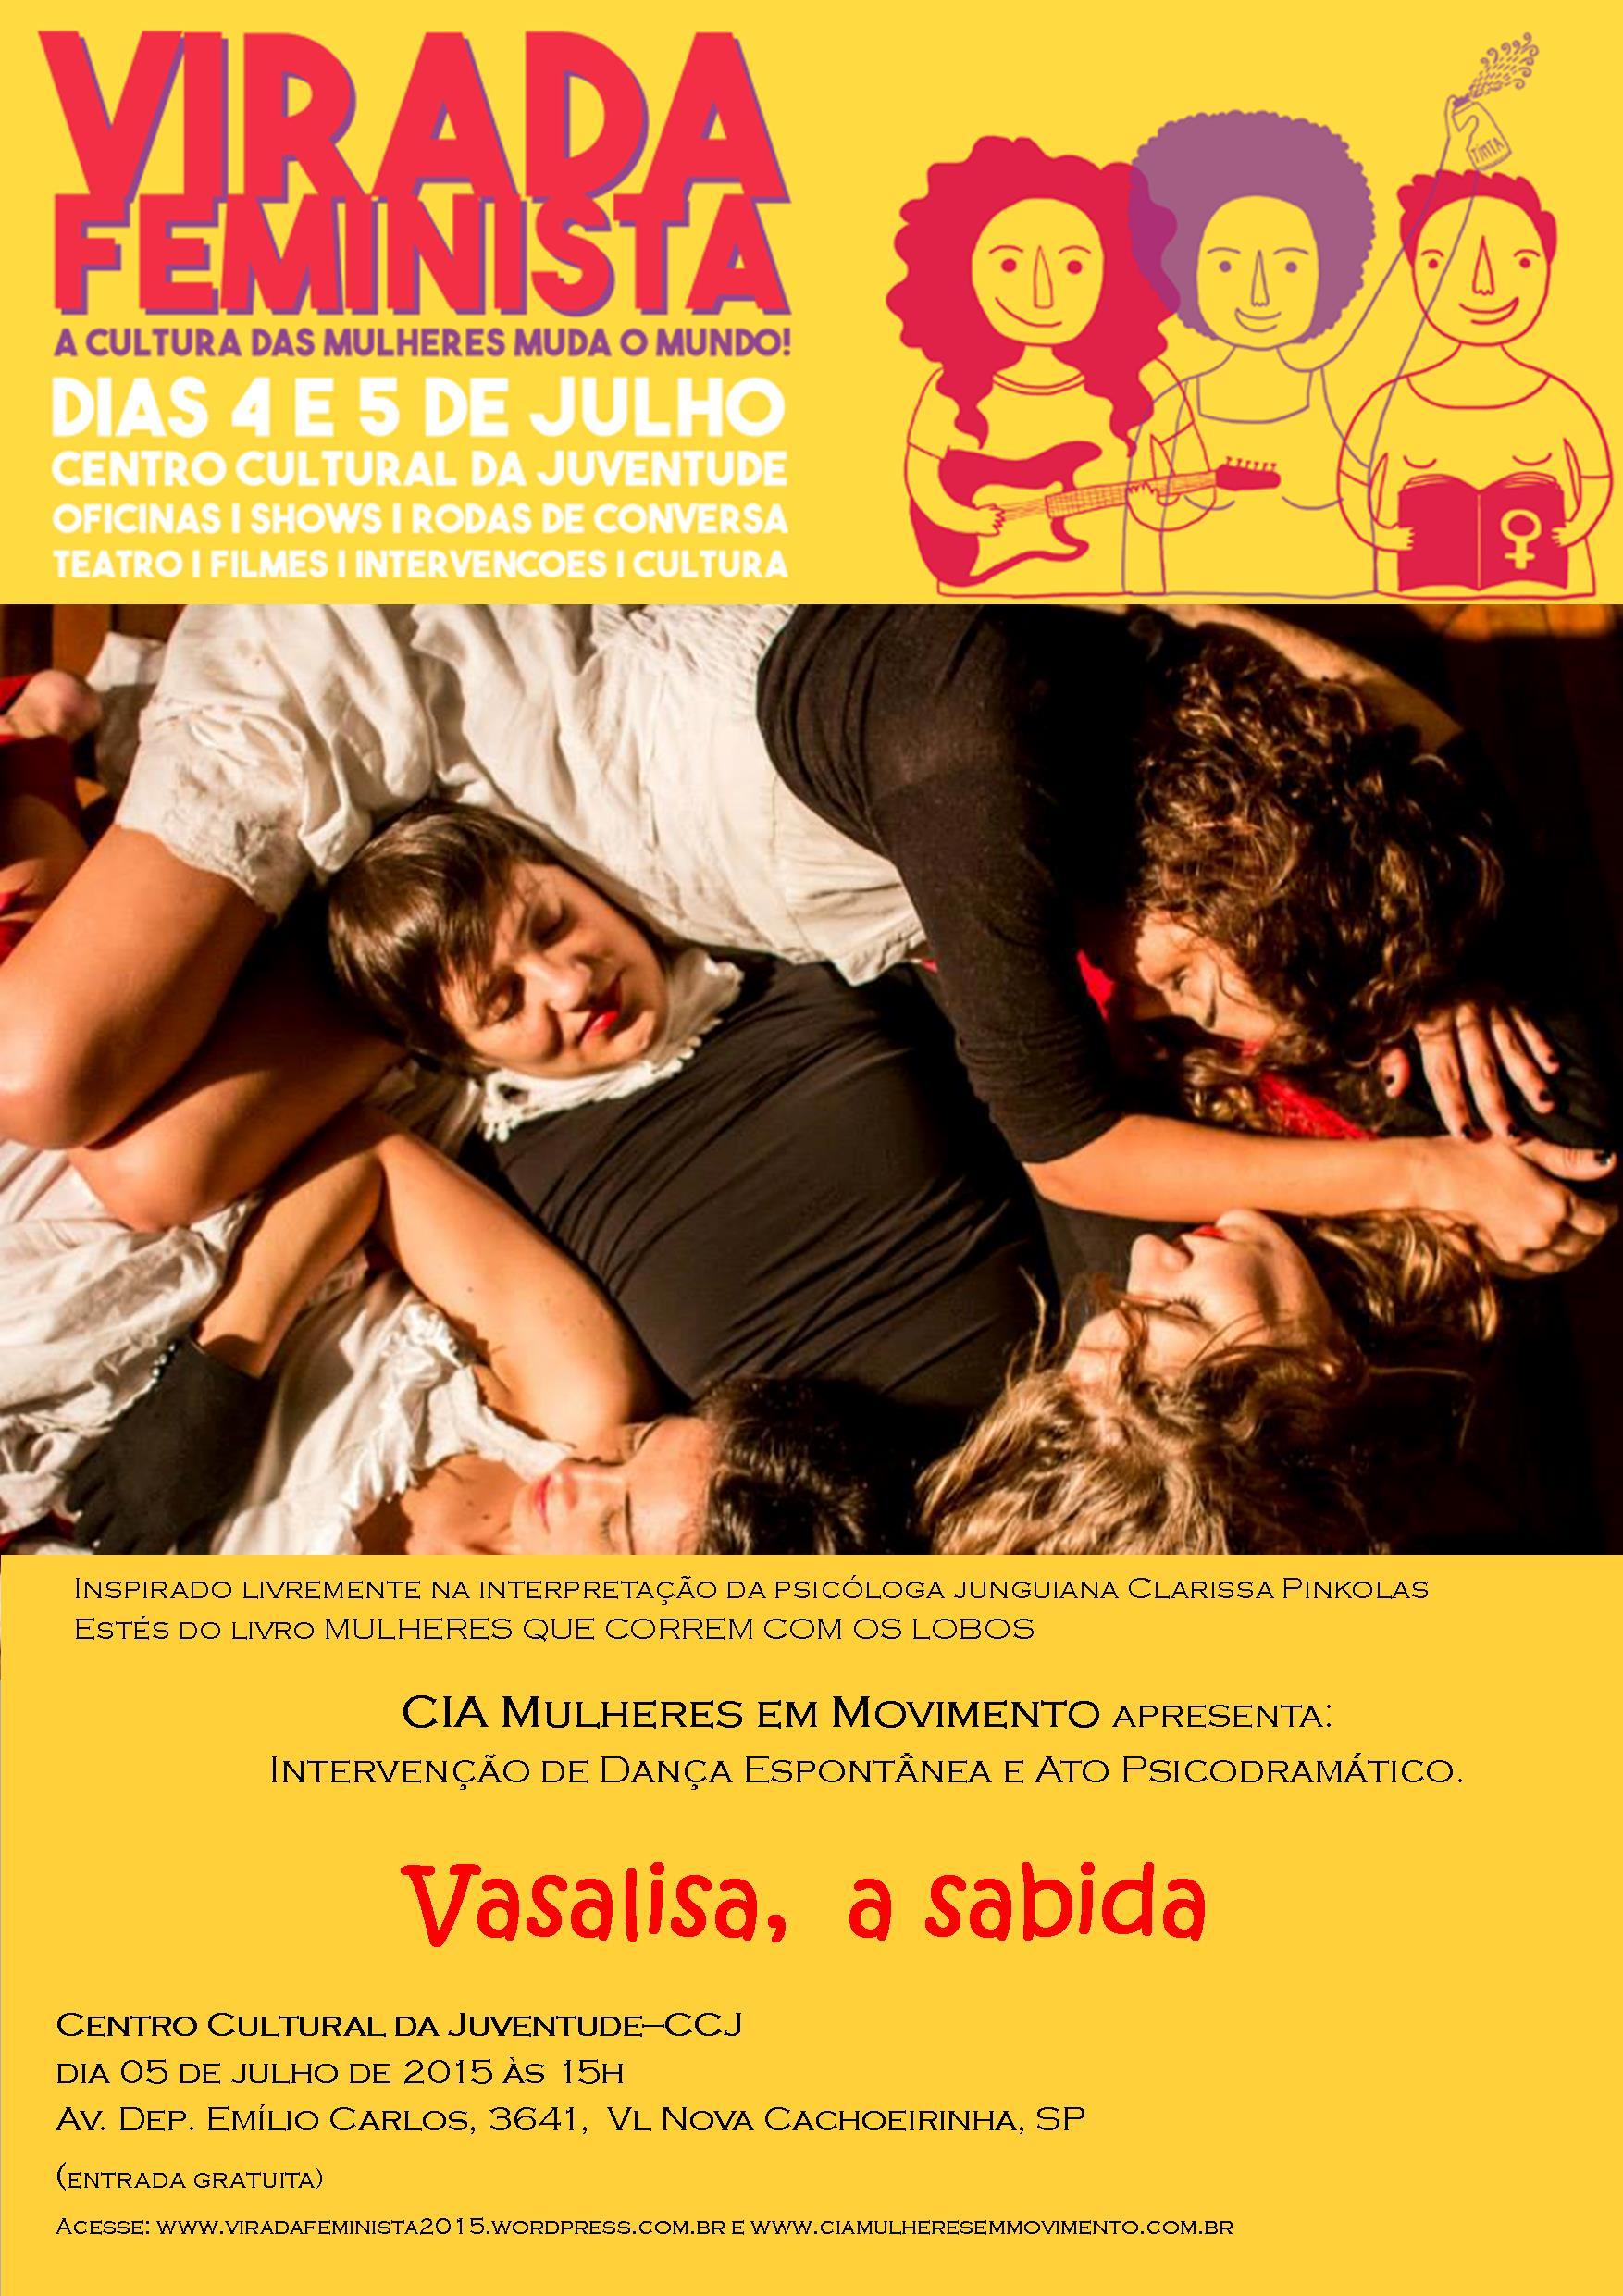 2015-07 Vasalisa Virada Feminista 2.jpg